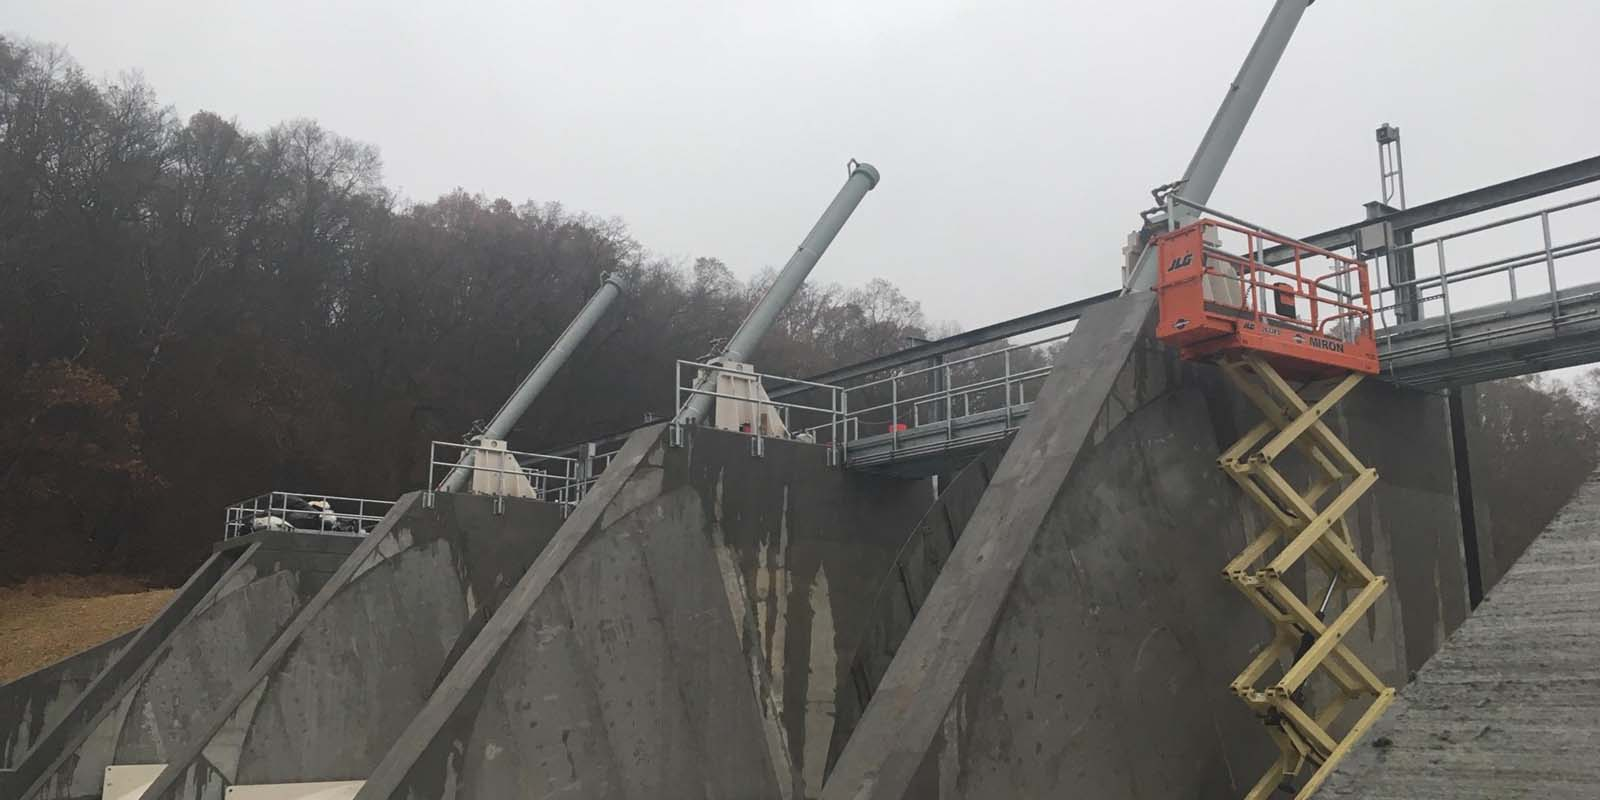 Willow river dam photo 1